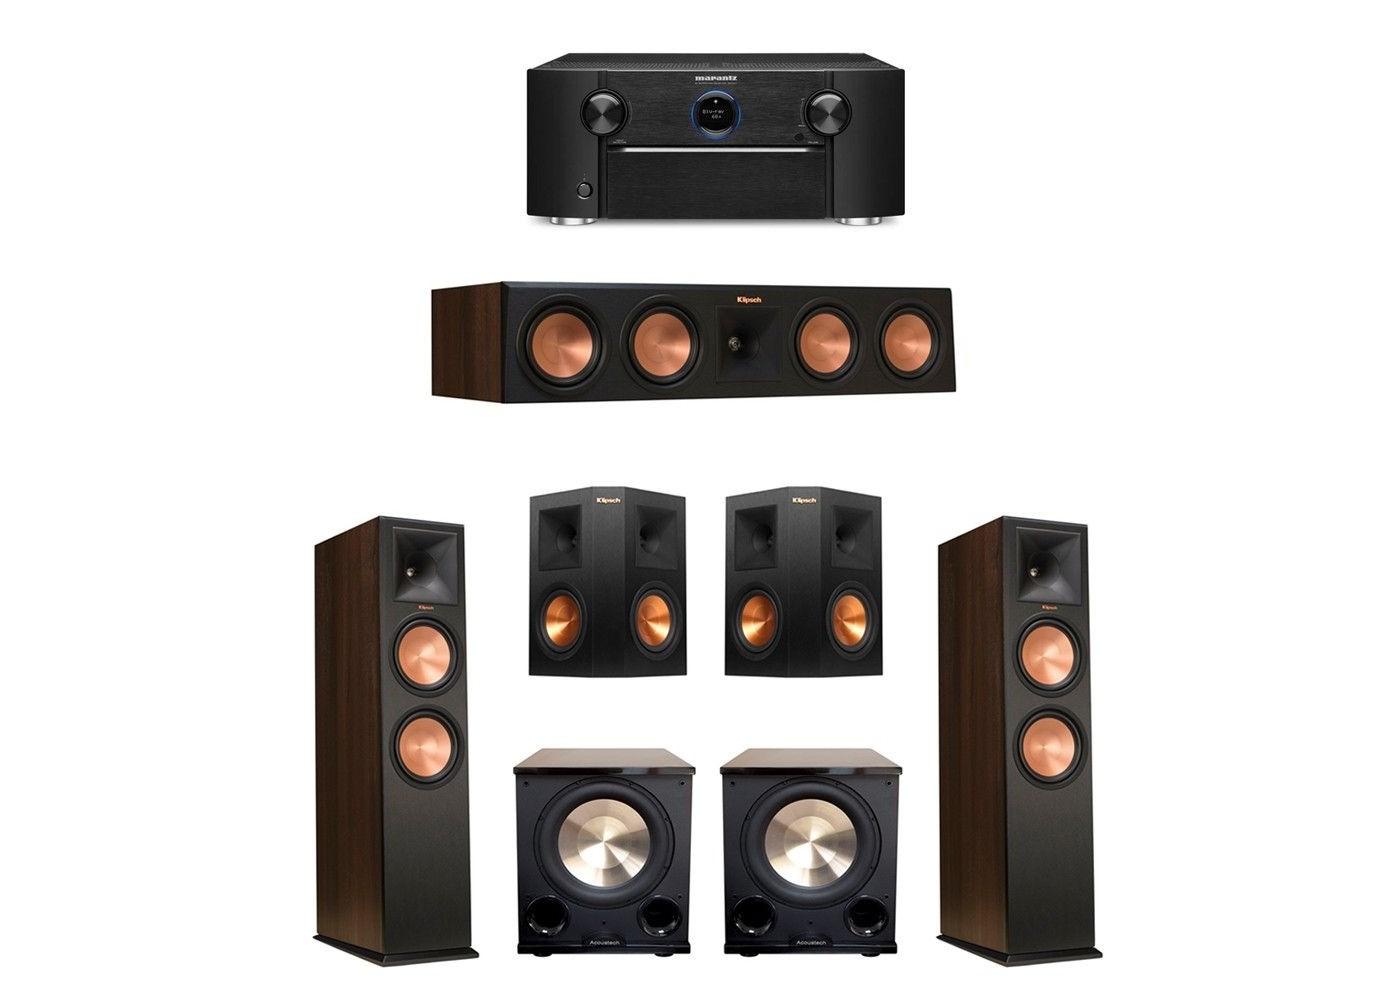 Klipsch Surround Sound >> Klipsch 5 2 Surround Sound Home Theater System Walnut